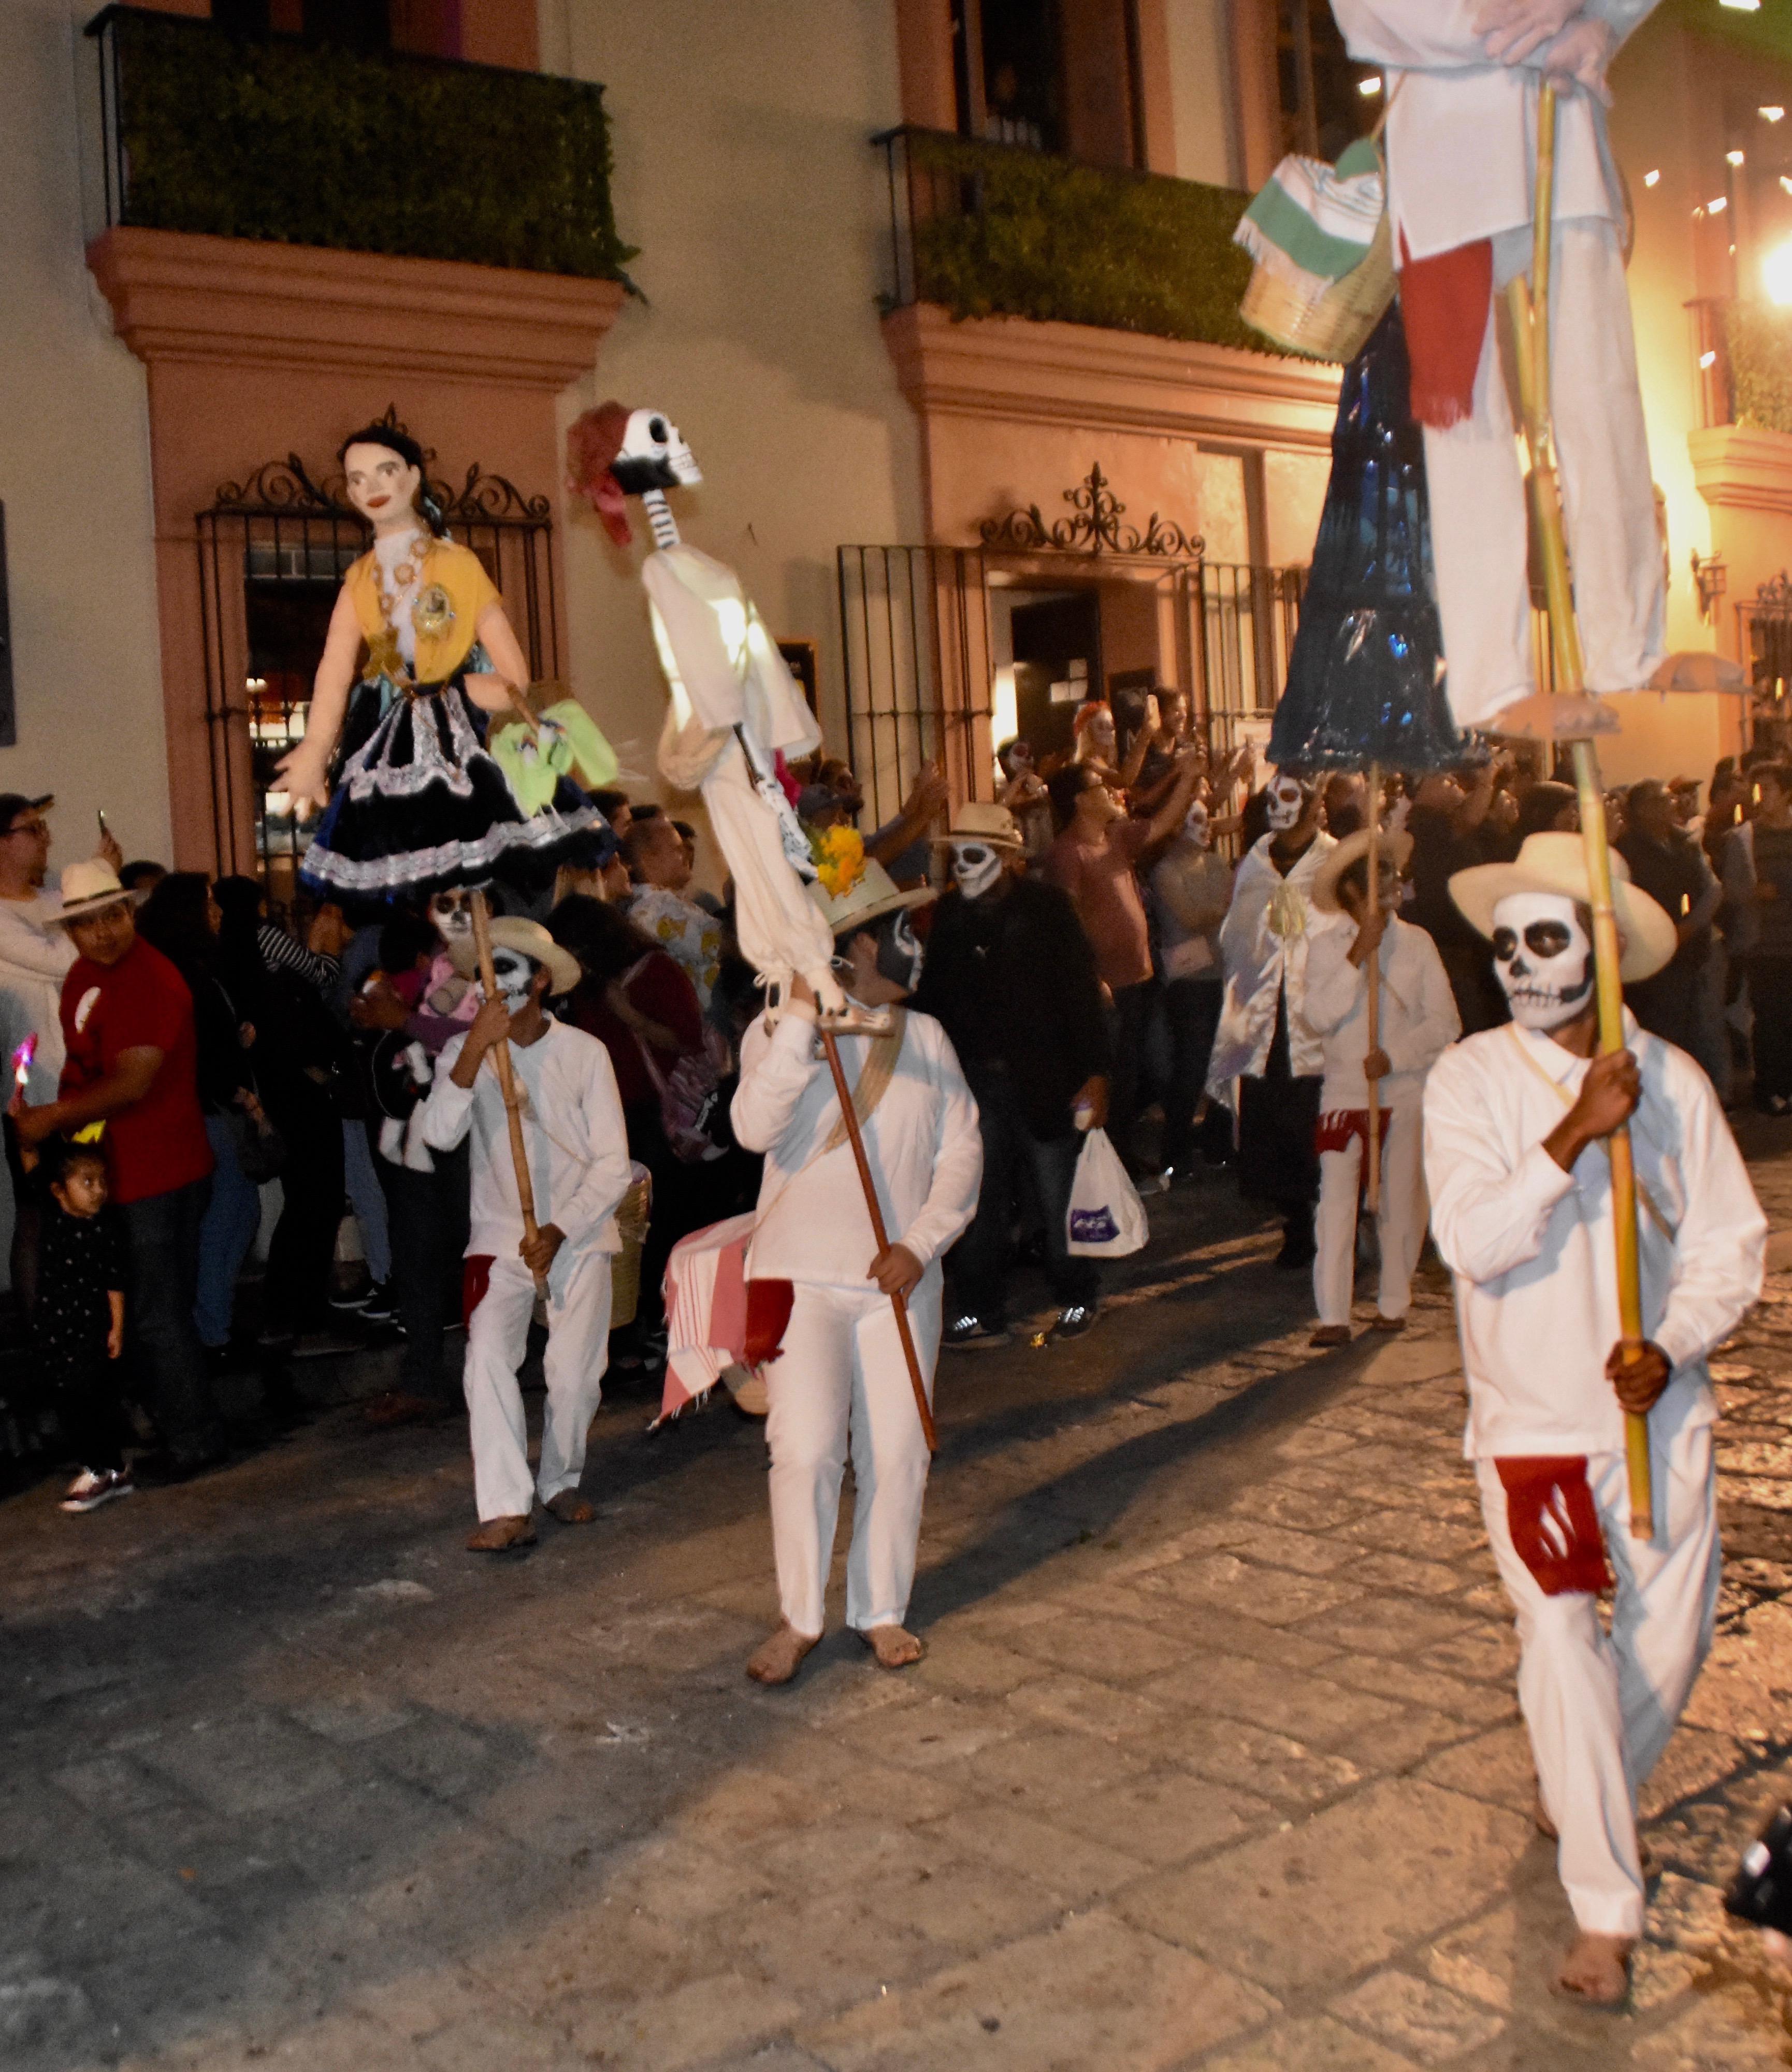 Skeleton Walkers, Day of the Dead parade, Oaxaca